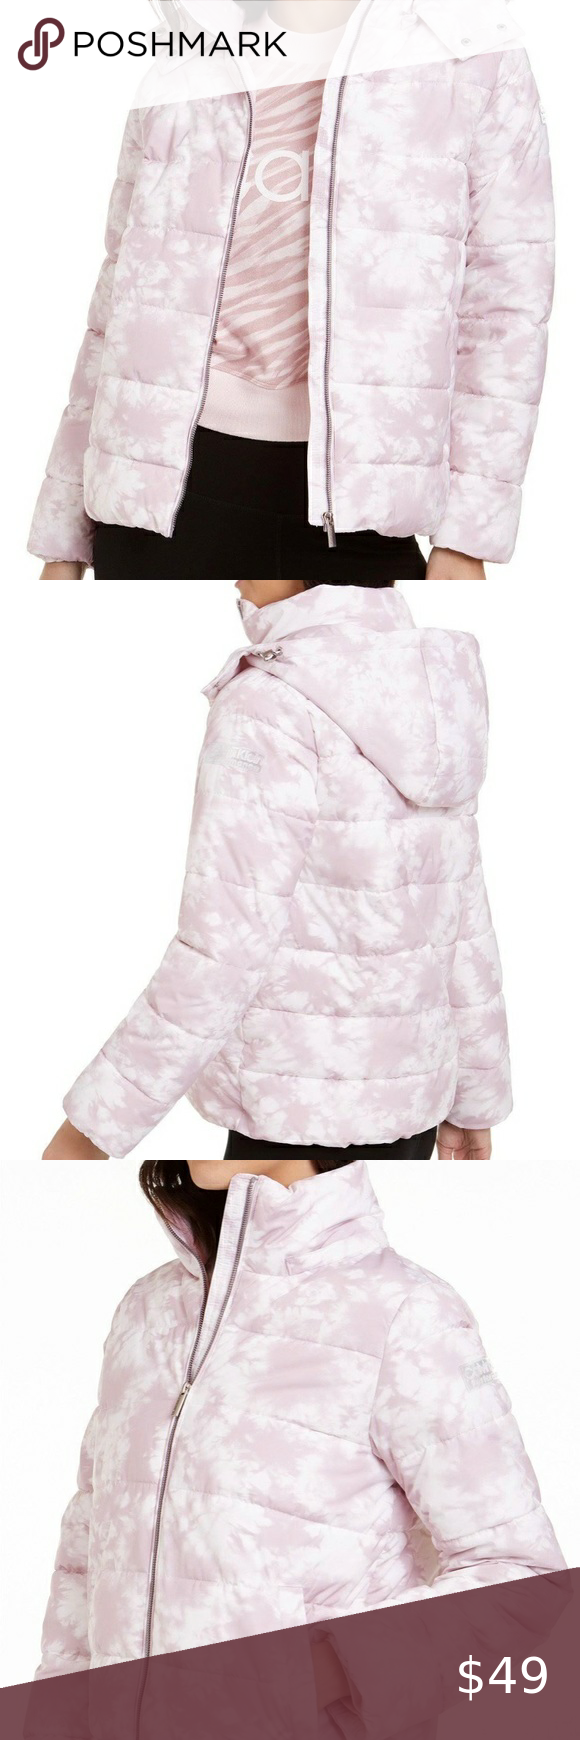 Nwt Calvin Klein Performance Puffer Jacket Calvin Klein Puffer Jackets Fashion [ 1740 x 580 Pixel ]